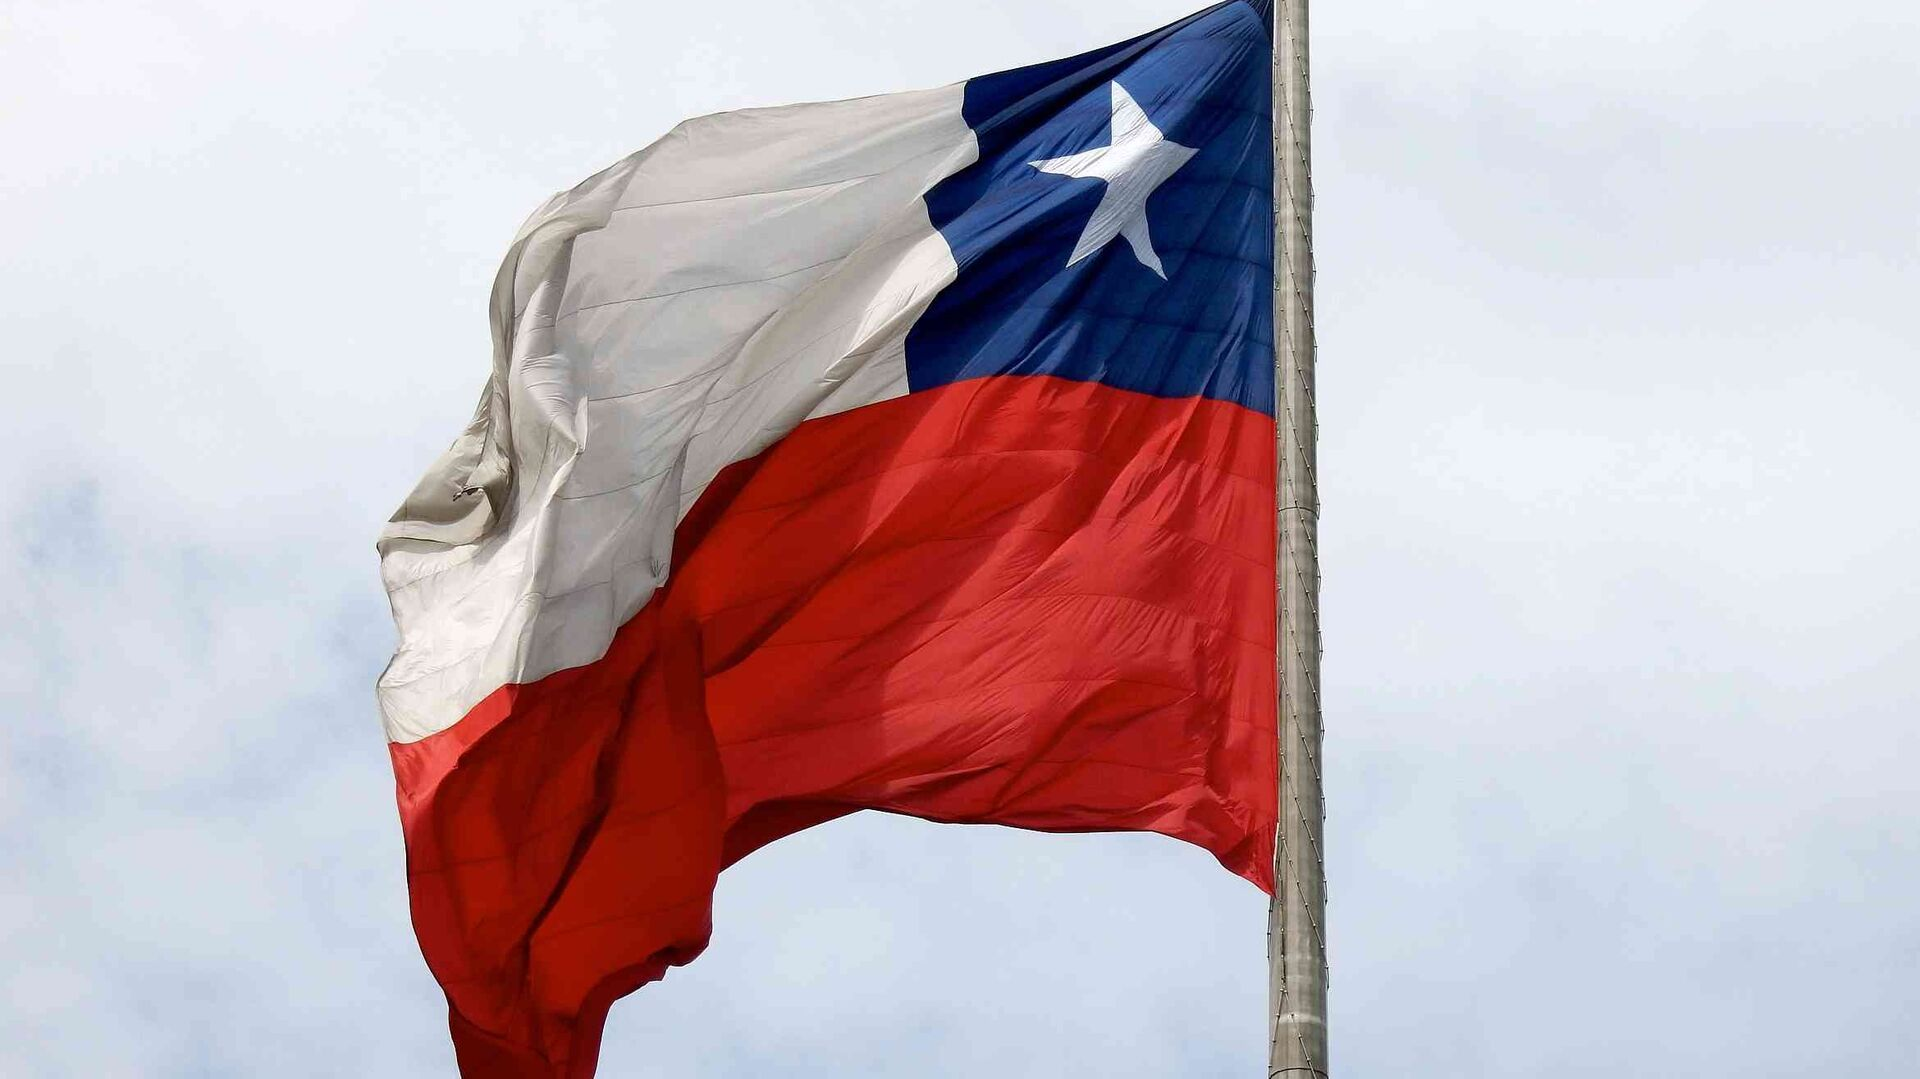 Bandera de Chile - Sputnik Mundo, 1920, 25.02.2021